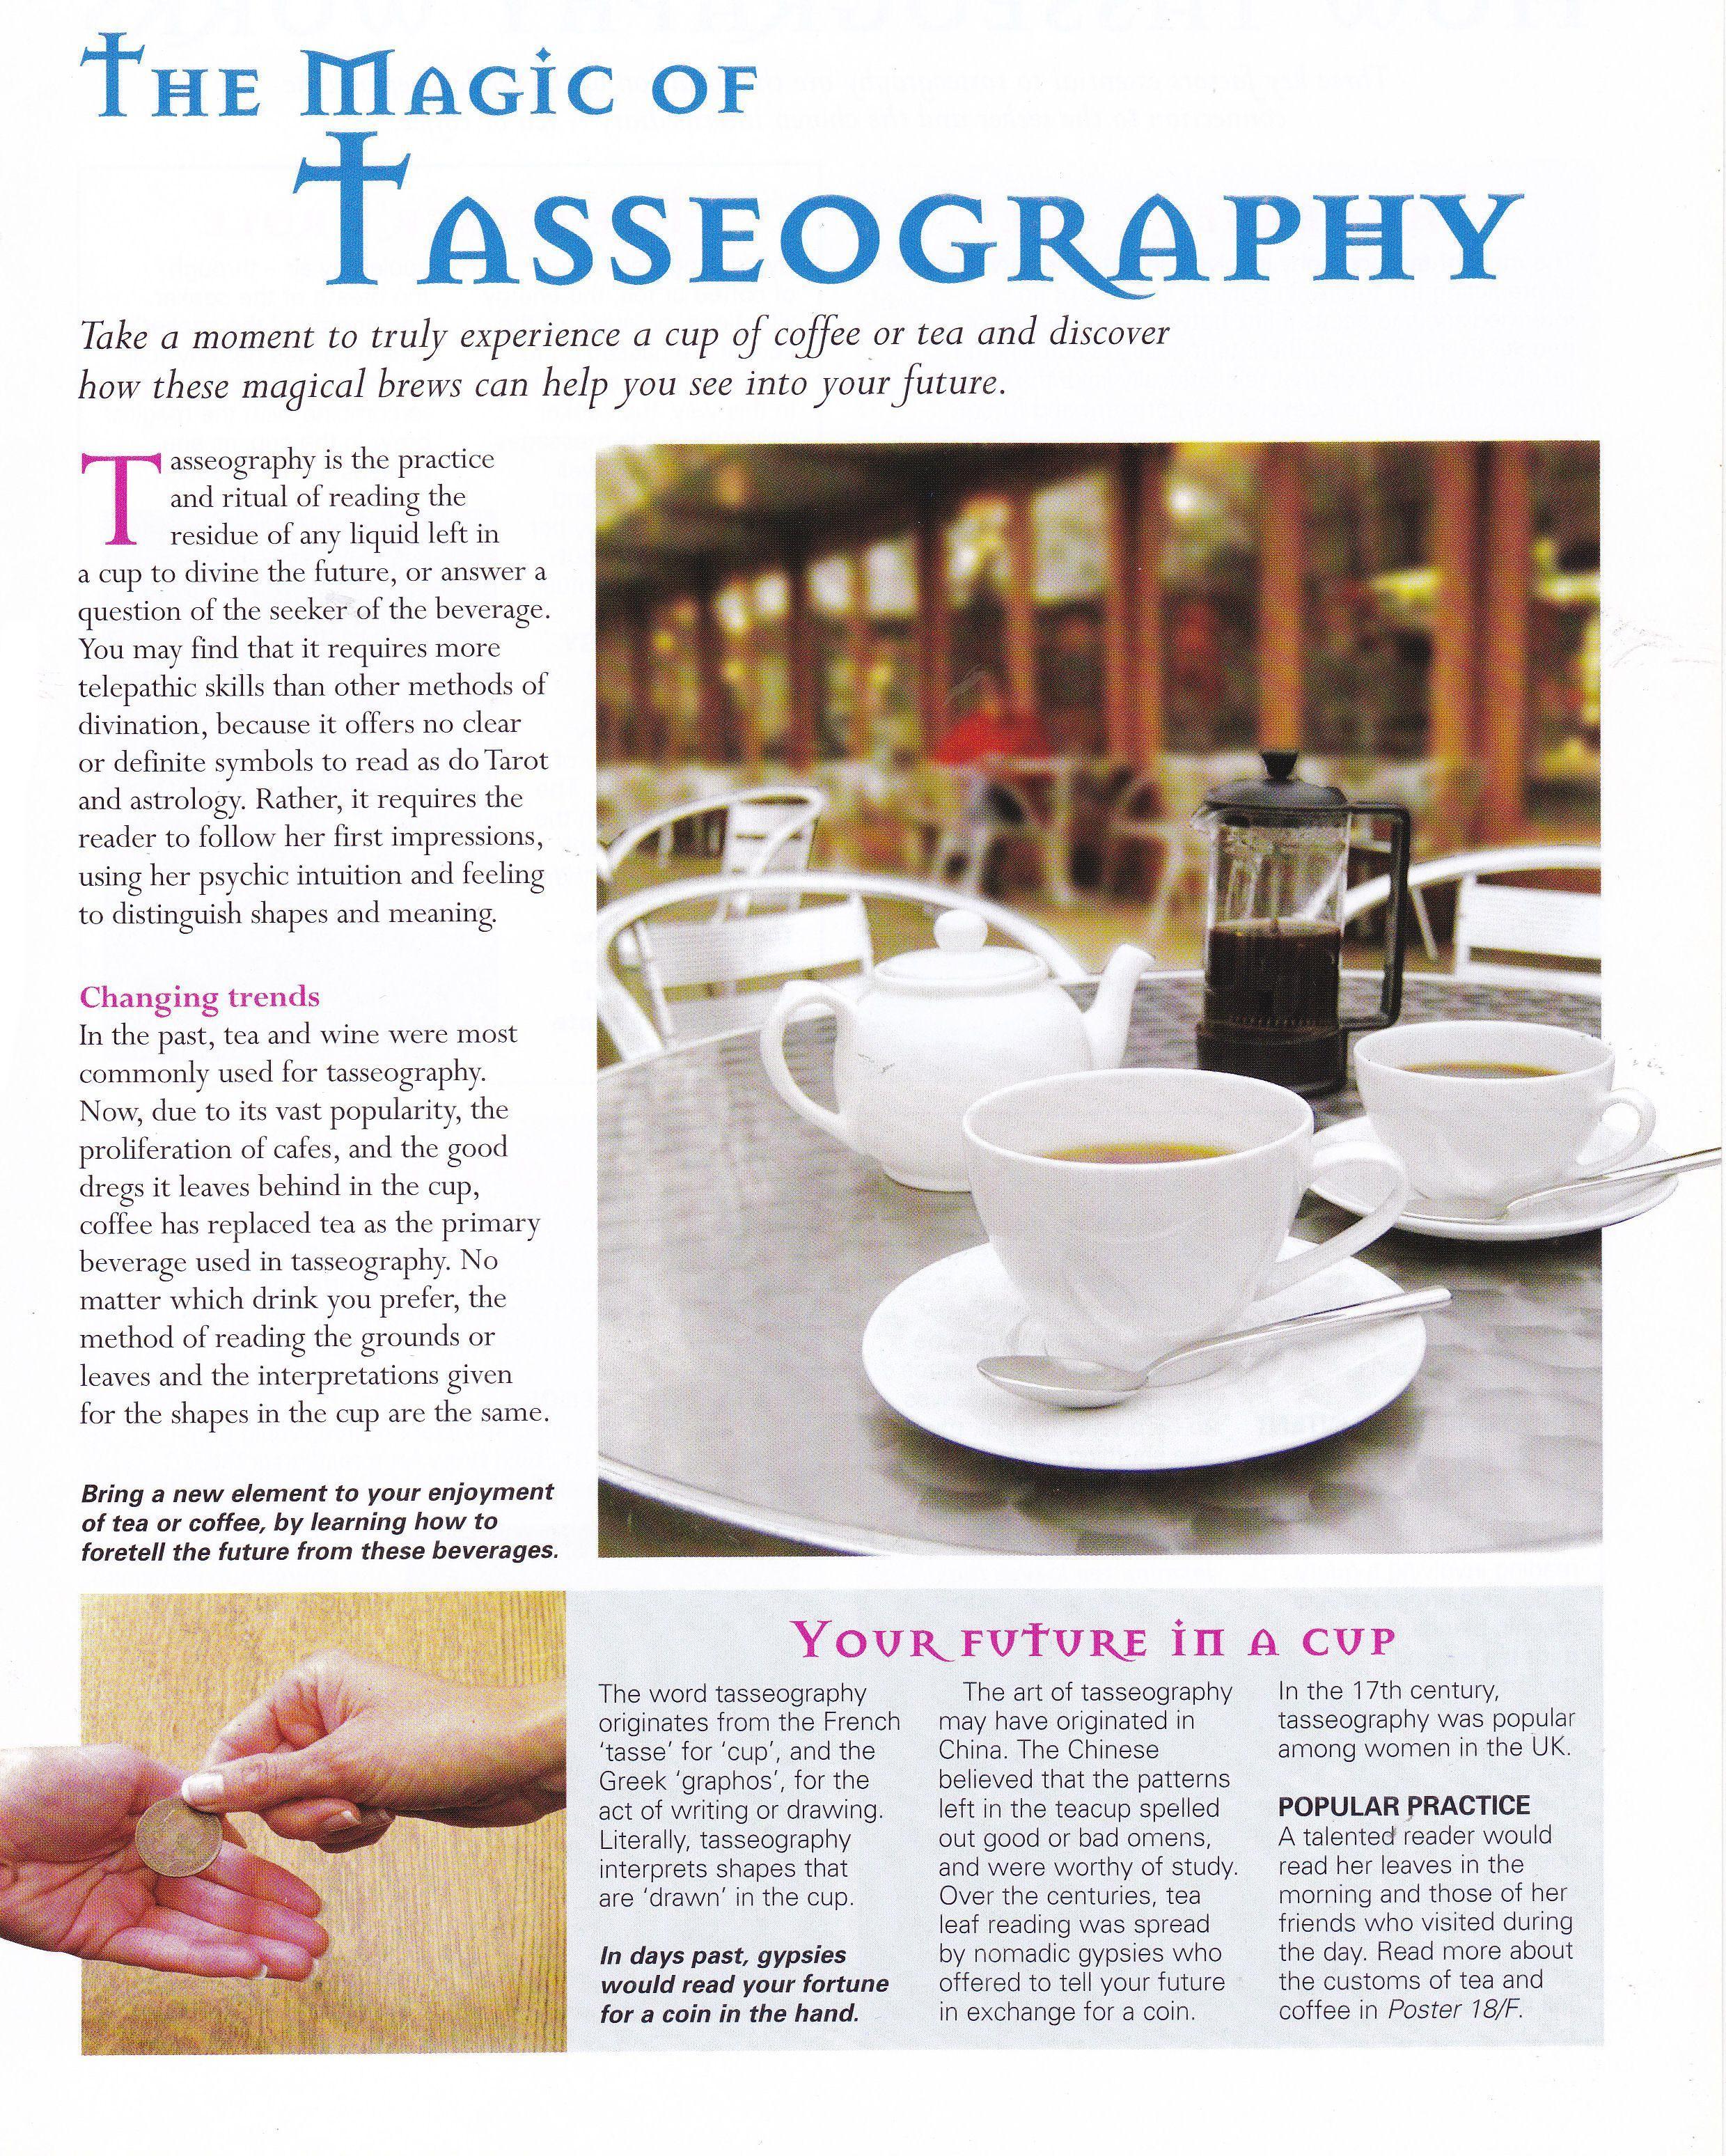 The magic of Tasseography Reading tea leaves, Tea